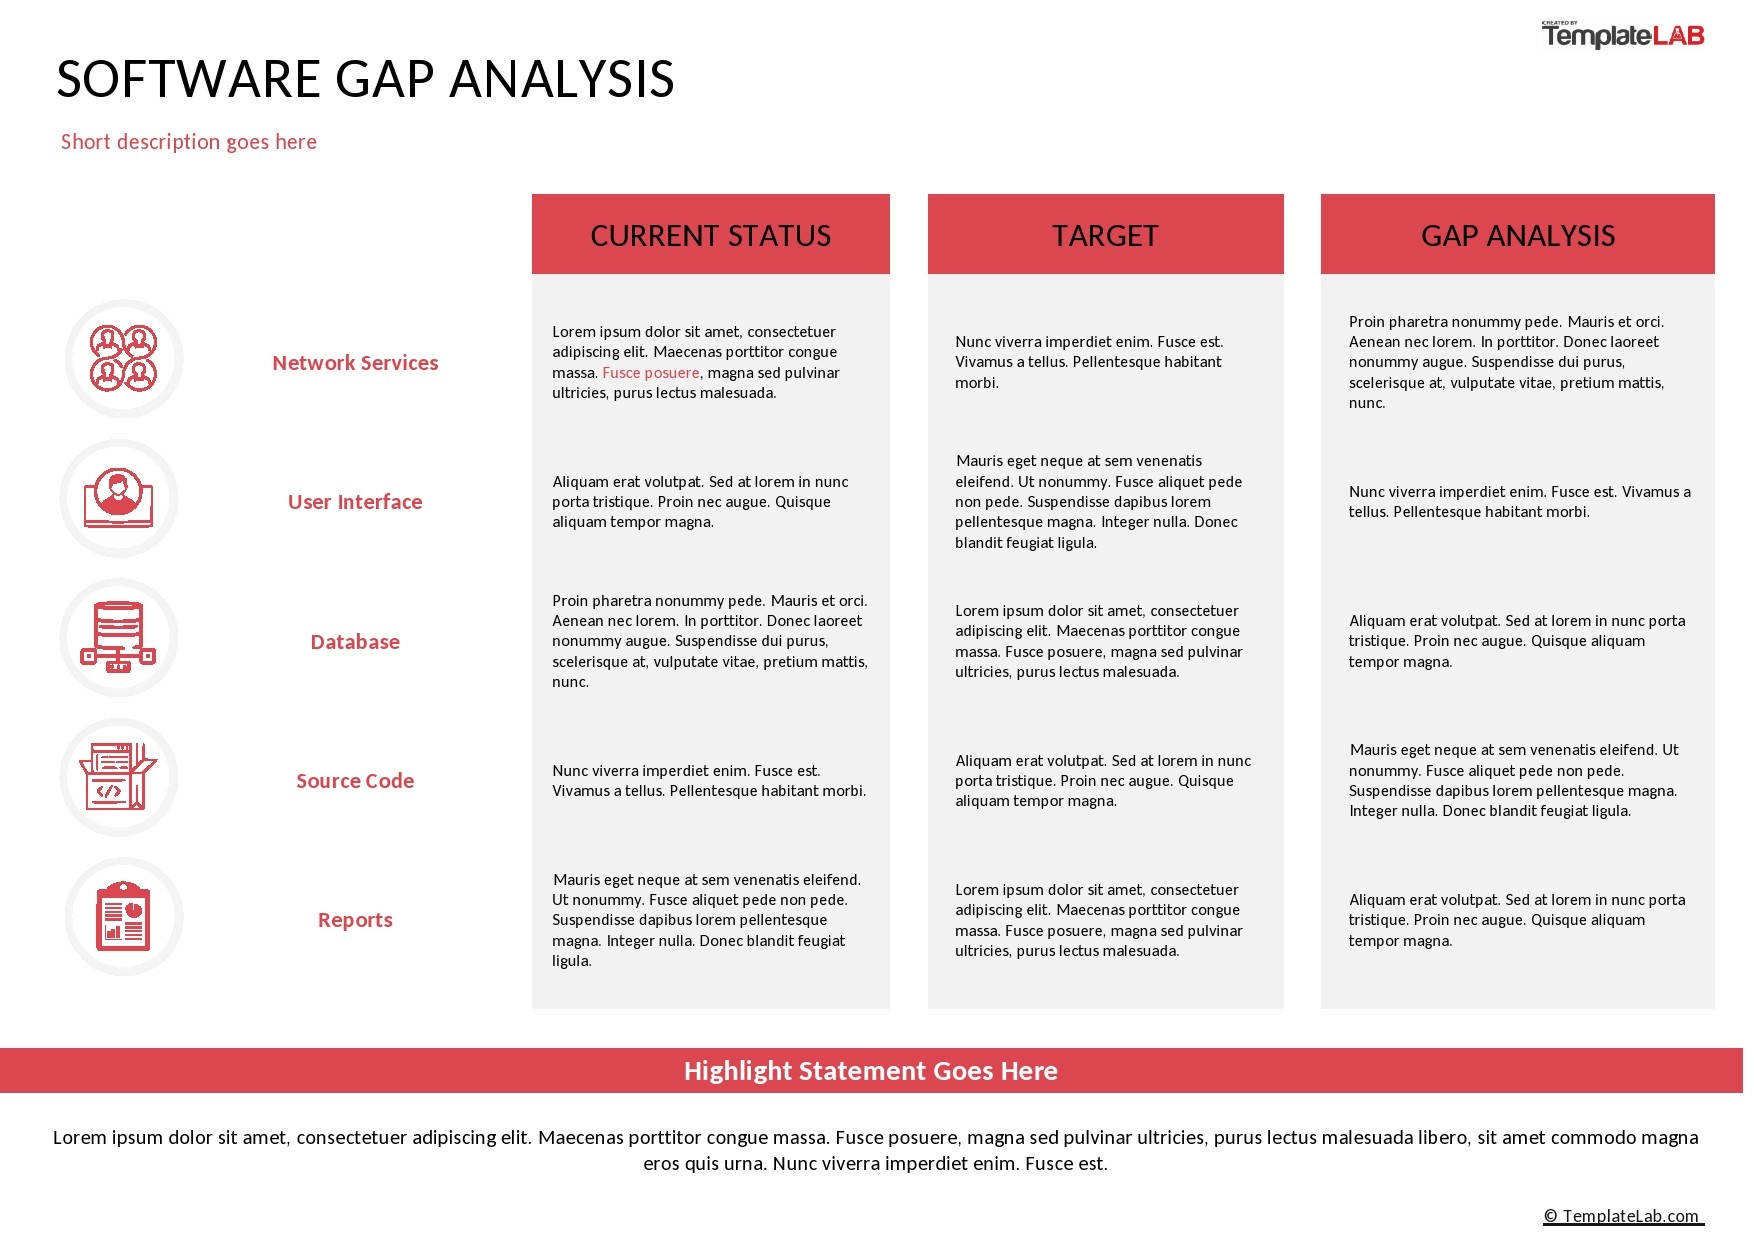 Free Software Gap Analysis Template - TemplateLab.com